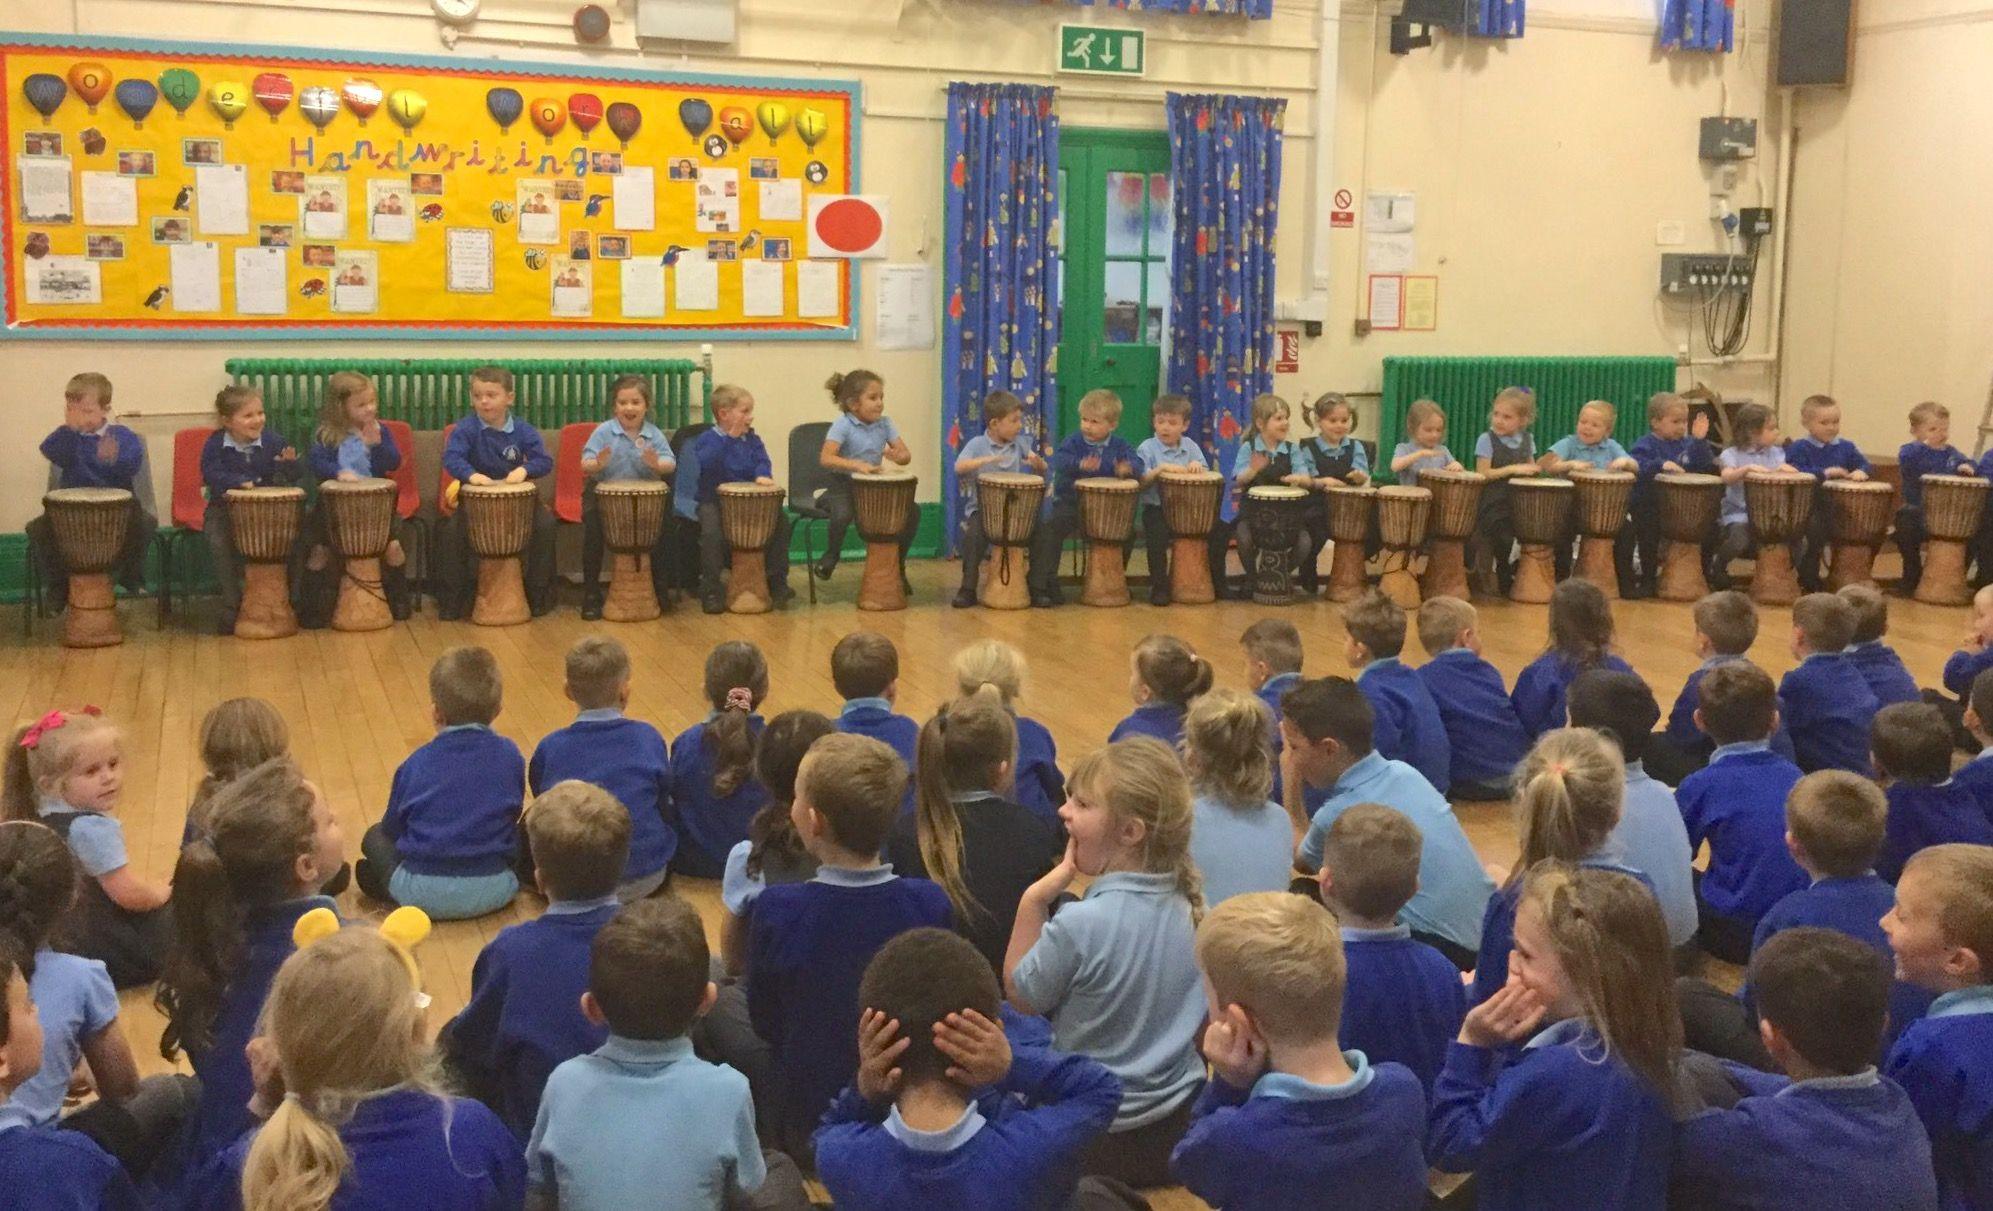 Pin By Beatfeet On Beatfeet Drumming In Schools